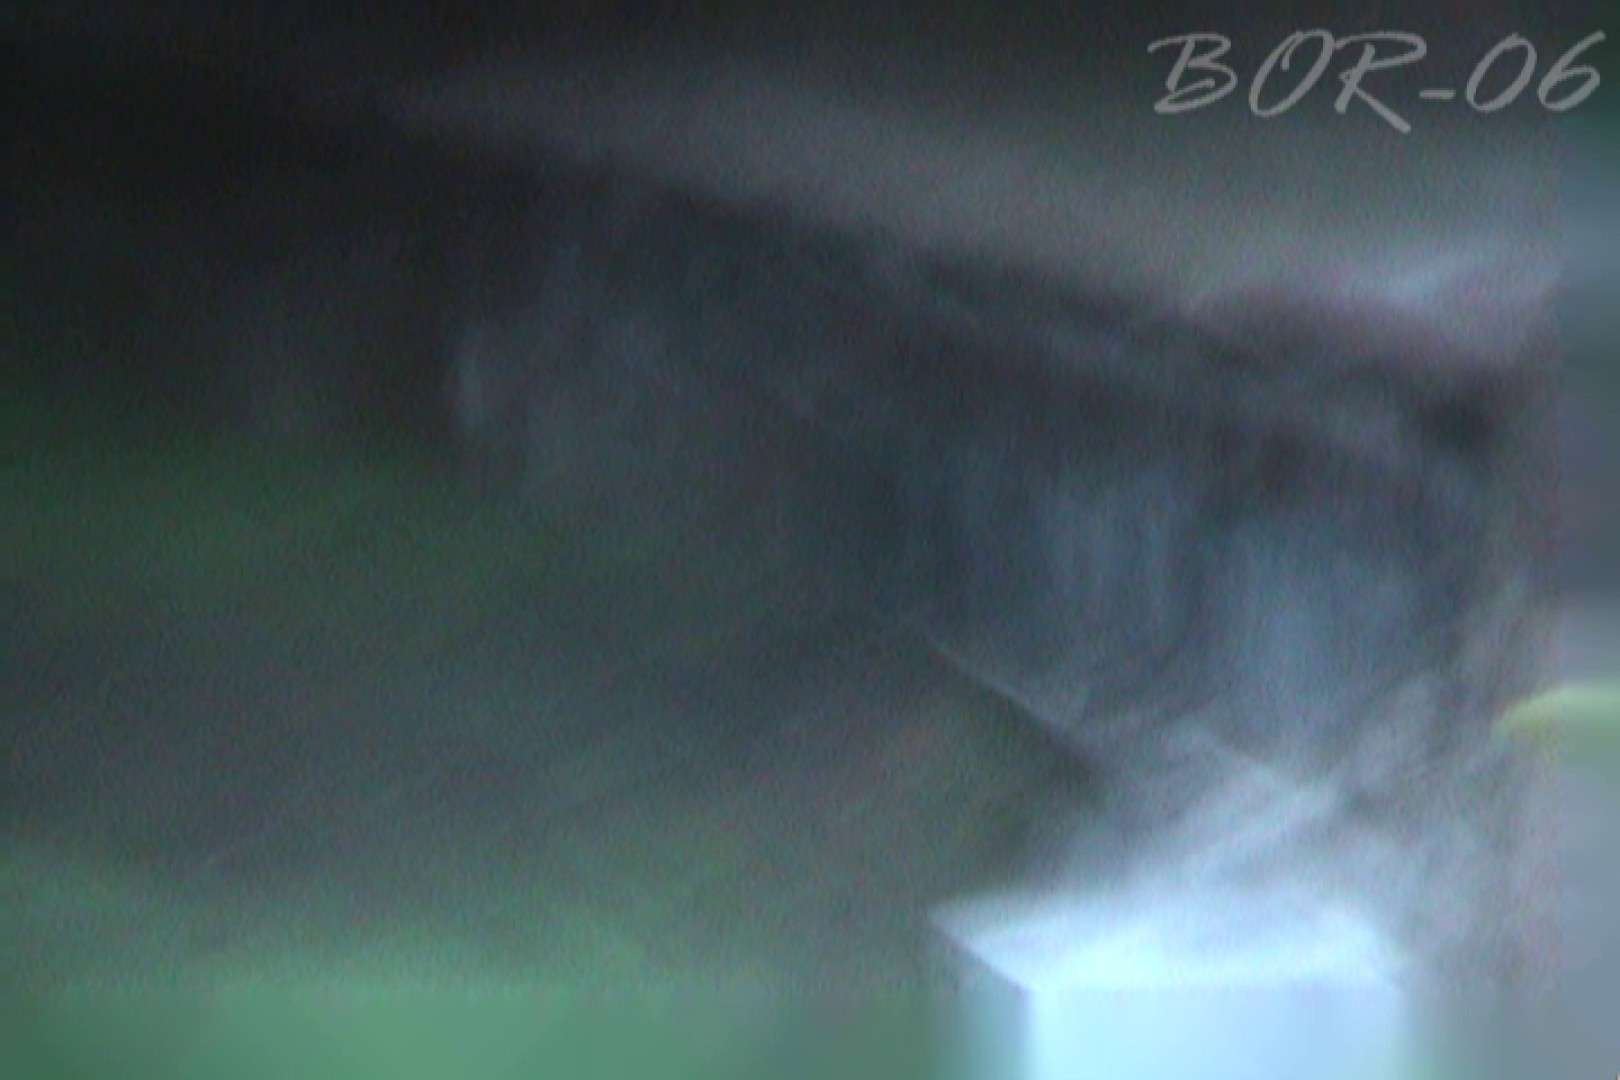 Aquaな露天風呂Vol.519 盗撮師作品  102pic 93